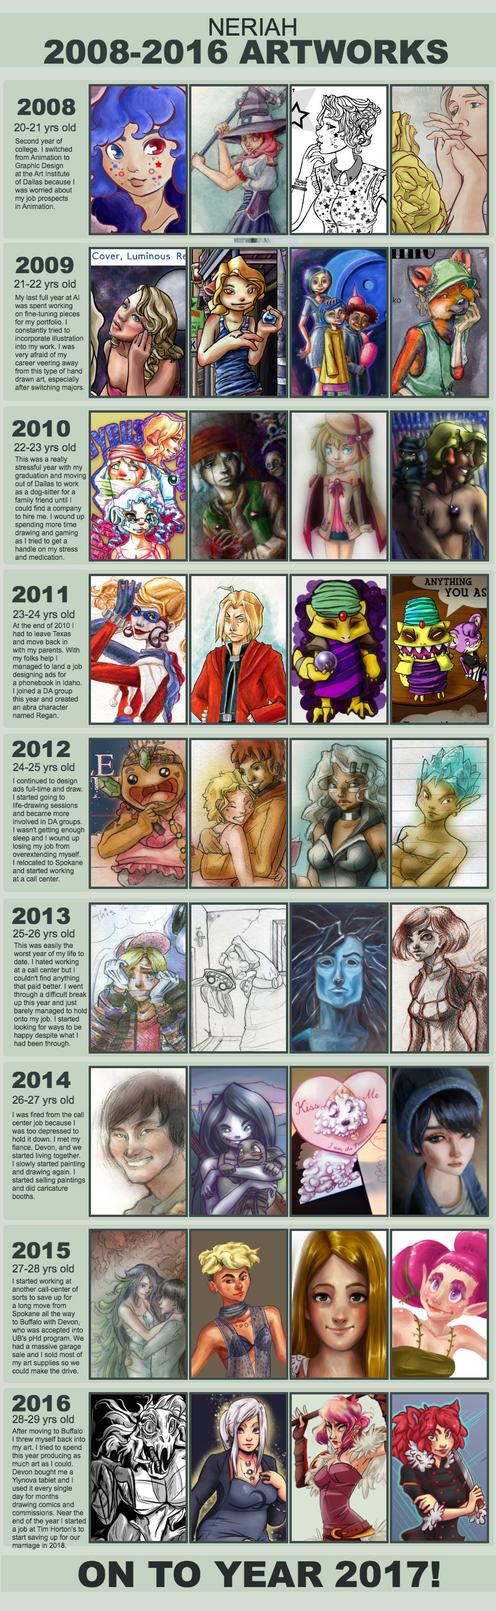 2008-2016 Artworks by Neriah